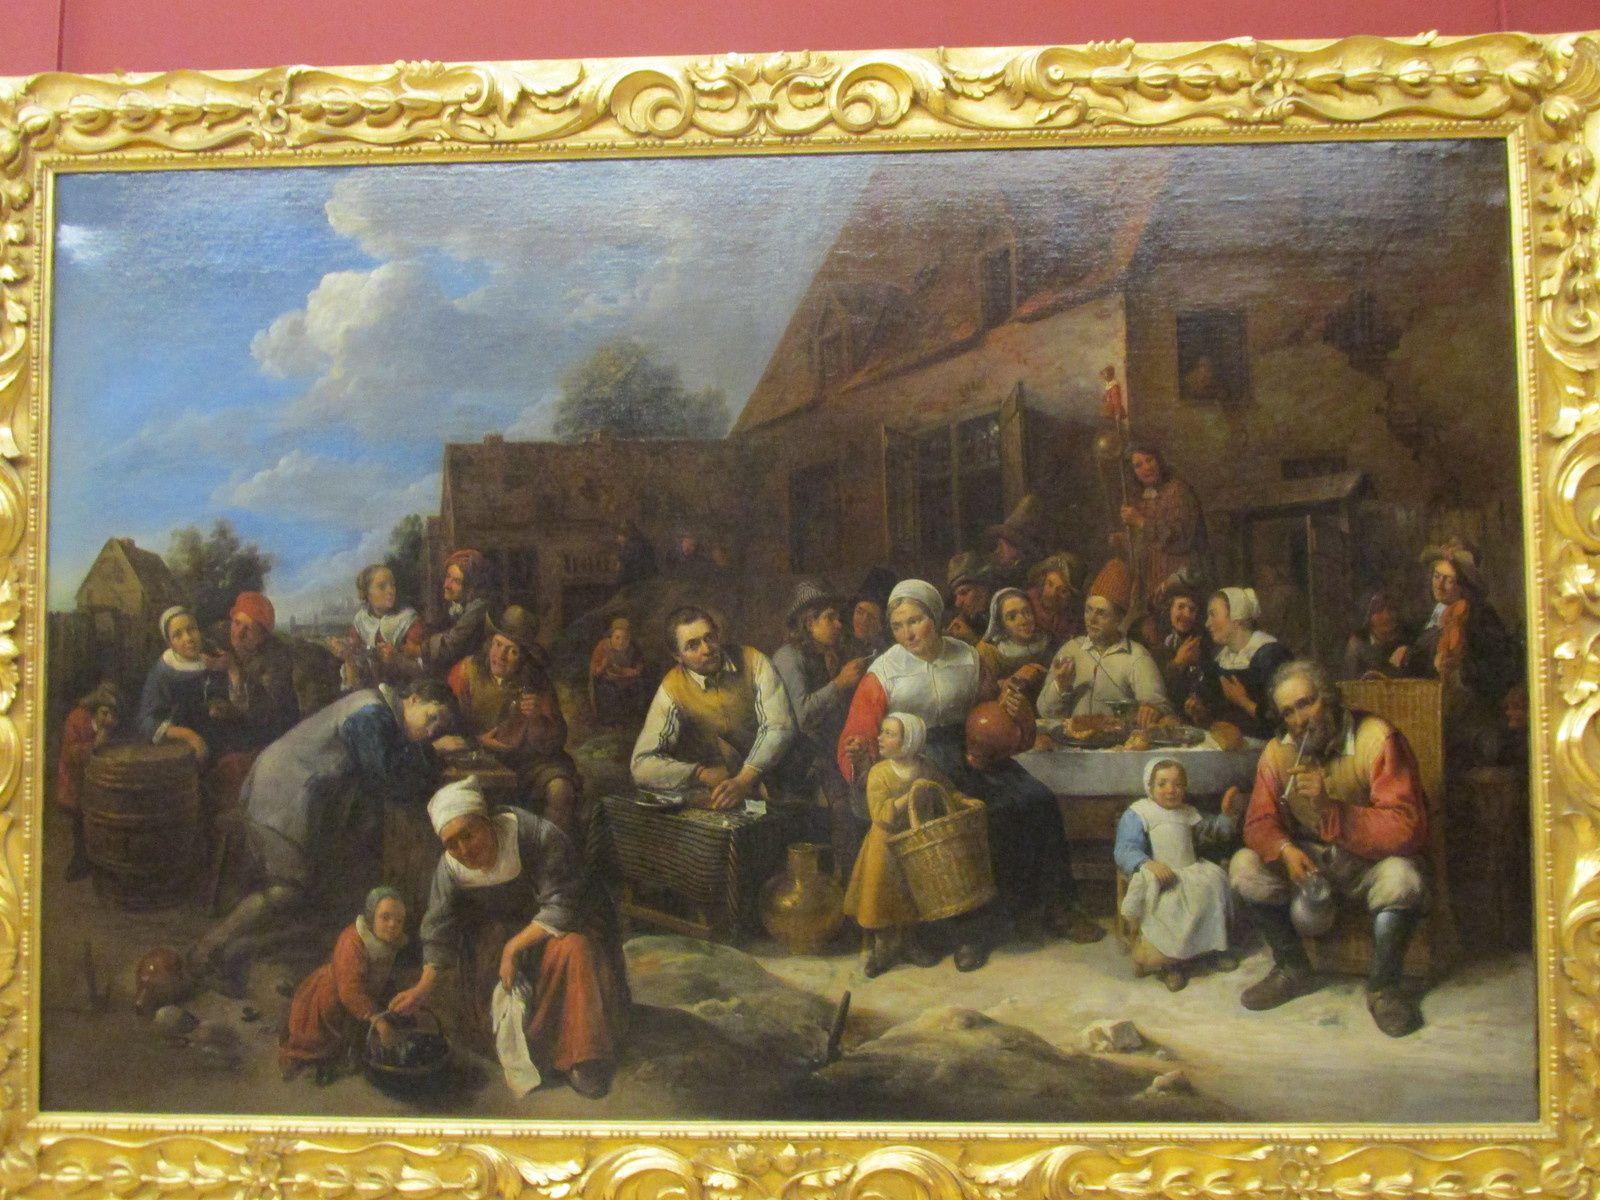 BANQUET VILLAGEOIS. 1678. GILLIS VAN TILBORCH